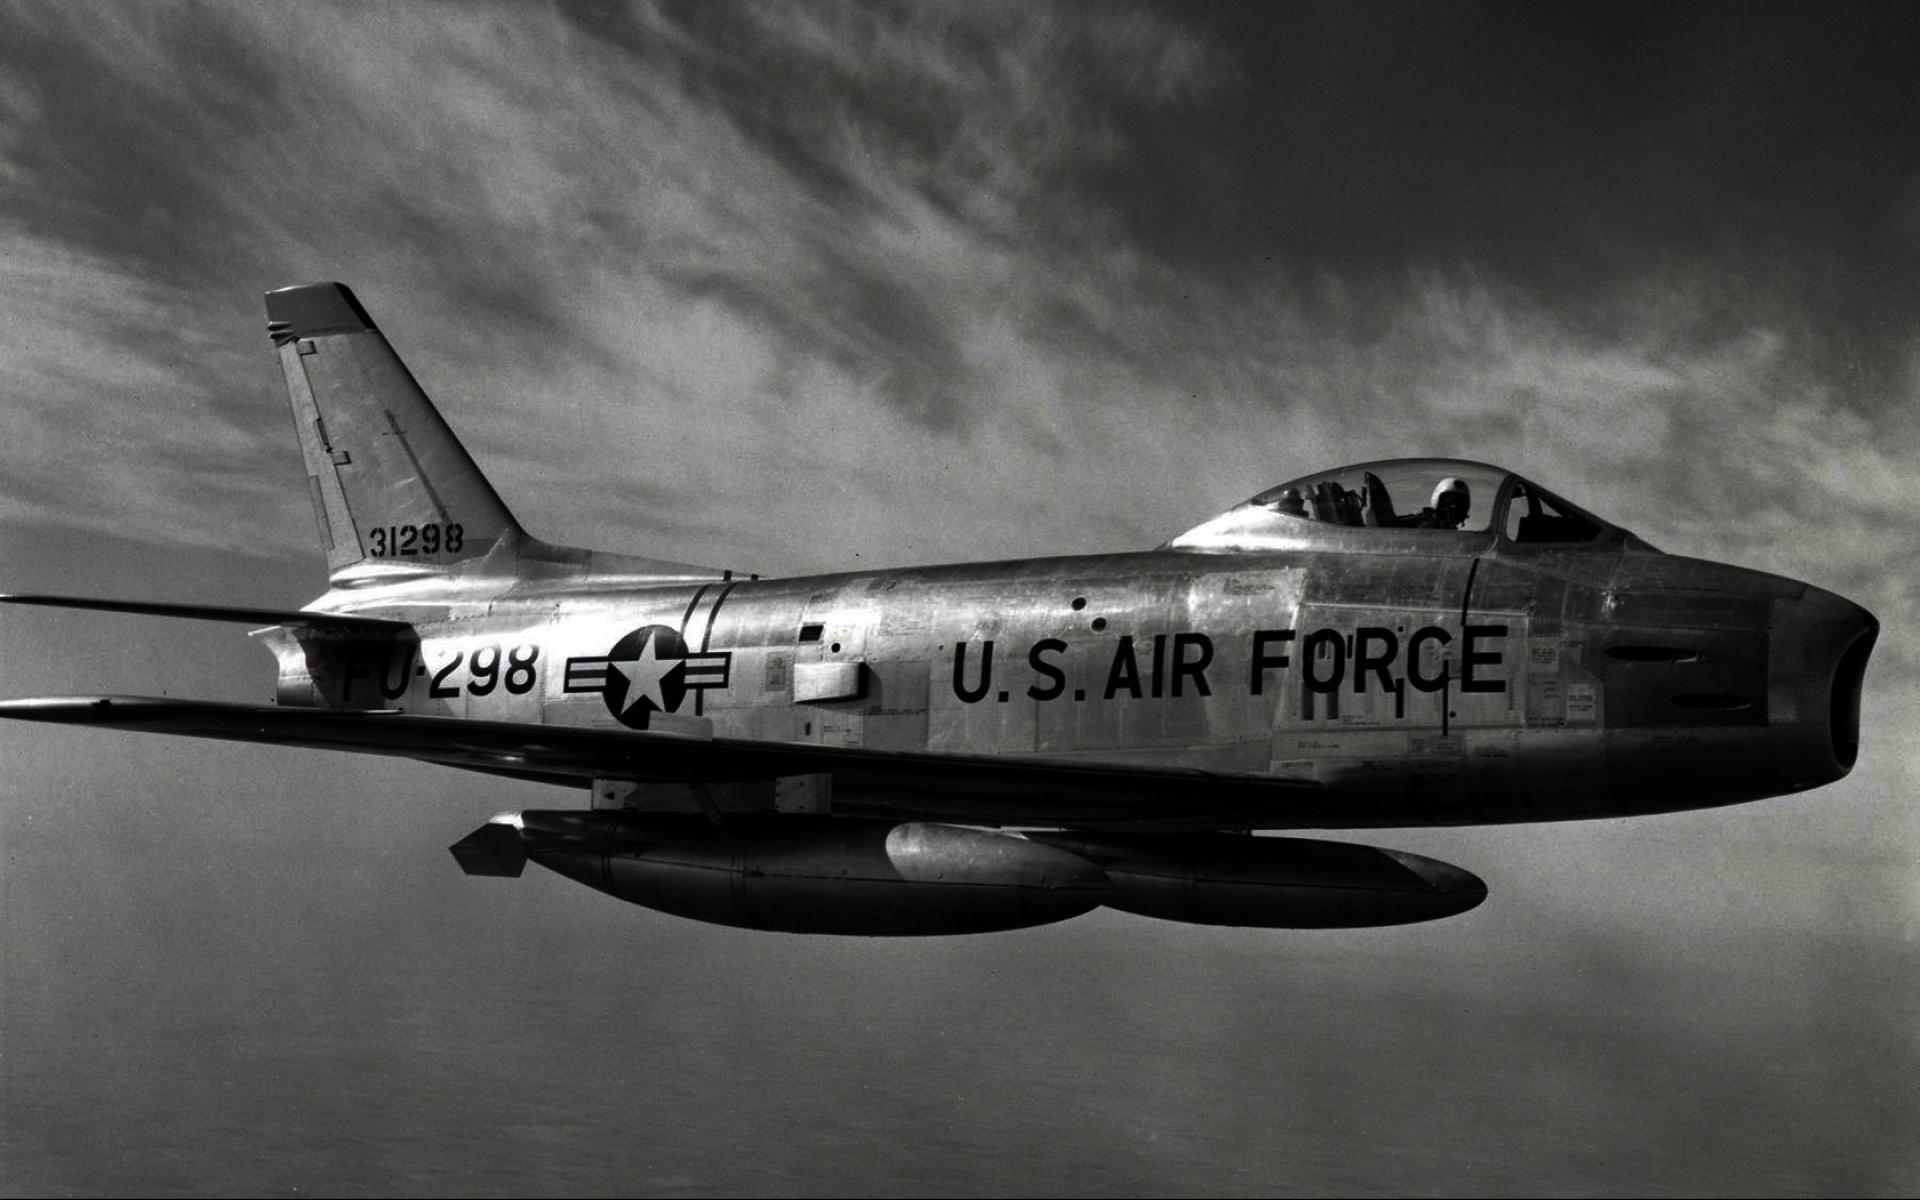 U.S. Air Force Wallpapers - Wallpaper Cave